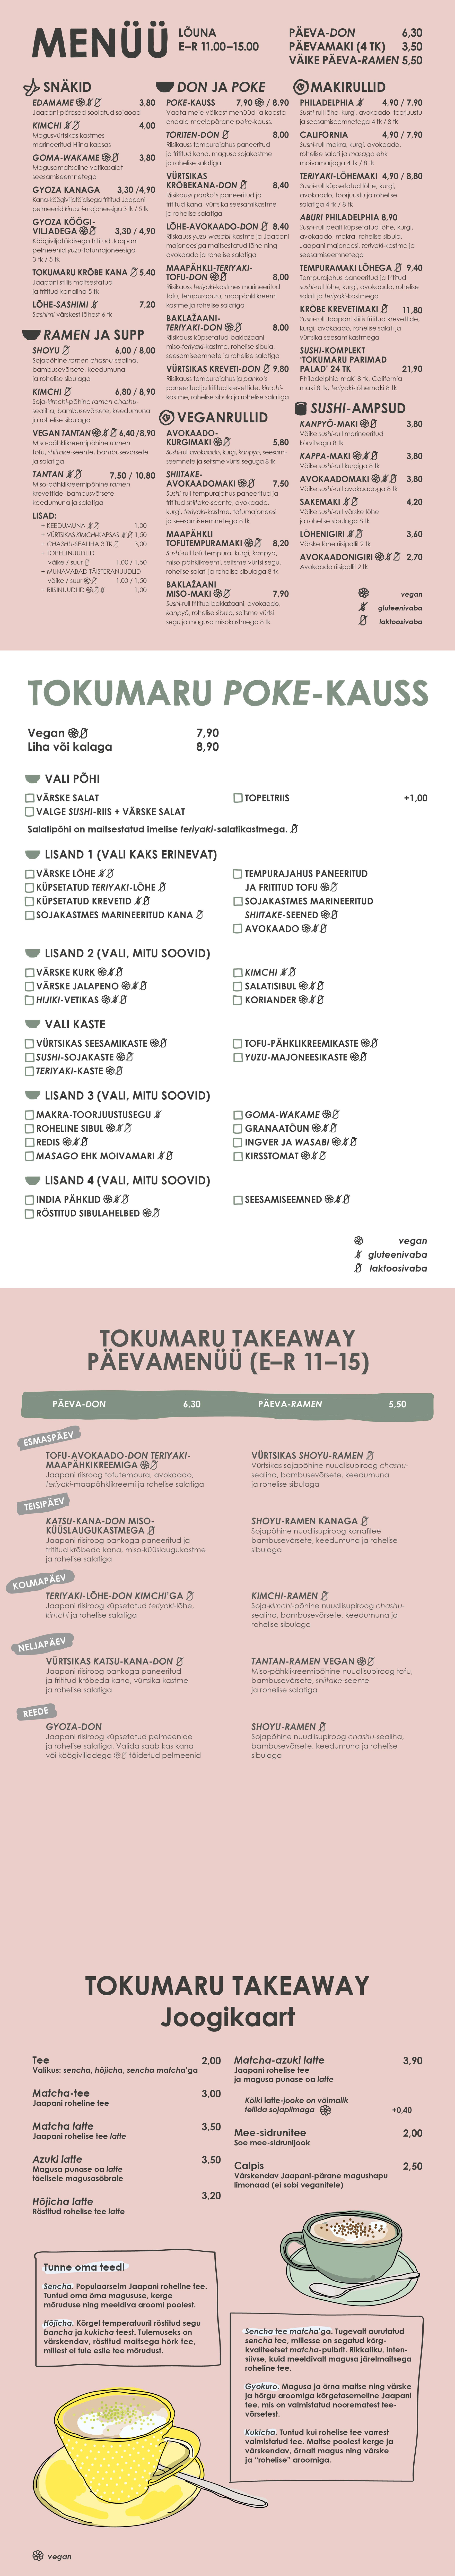 takeaway-veebimenyy-suvi-20192.jpg